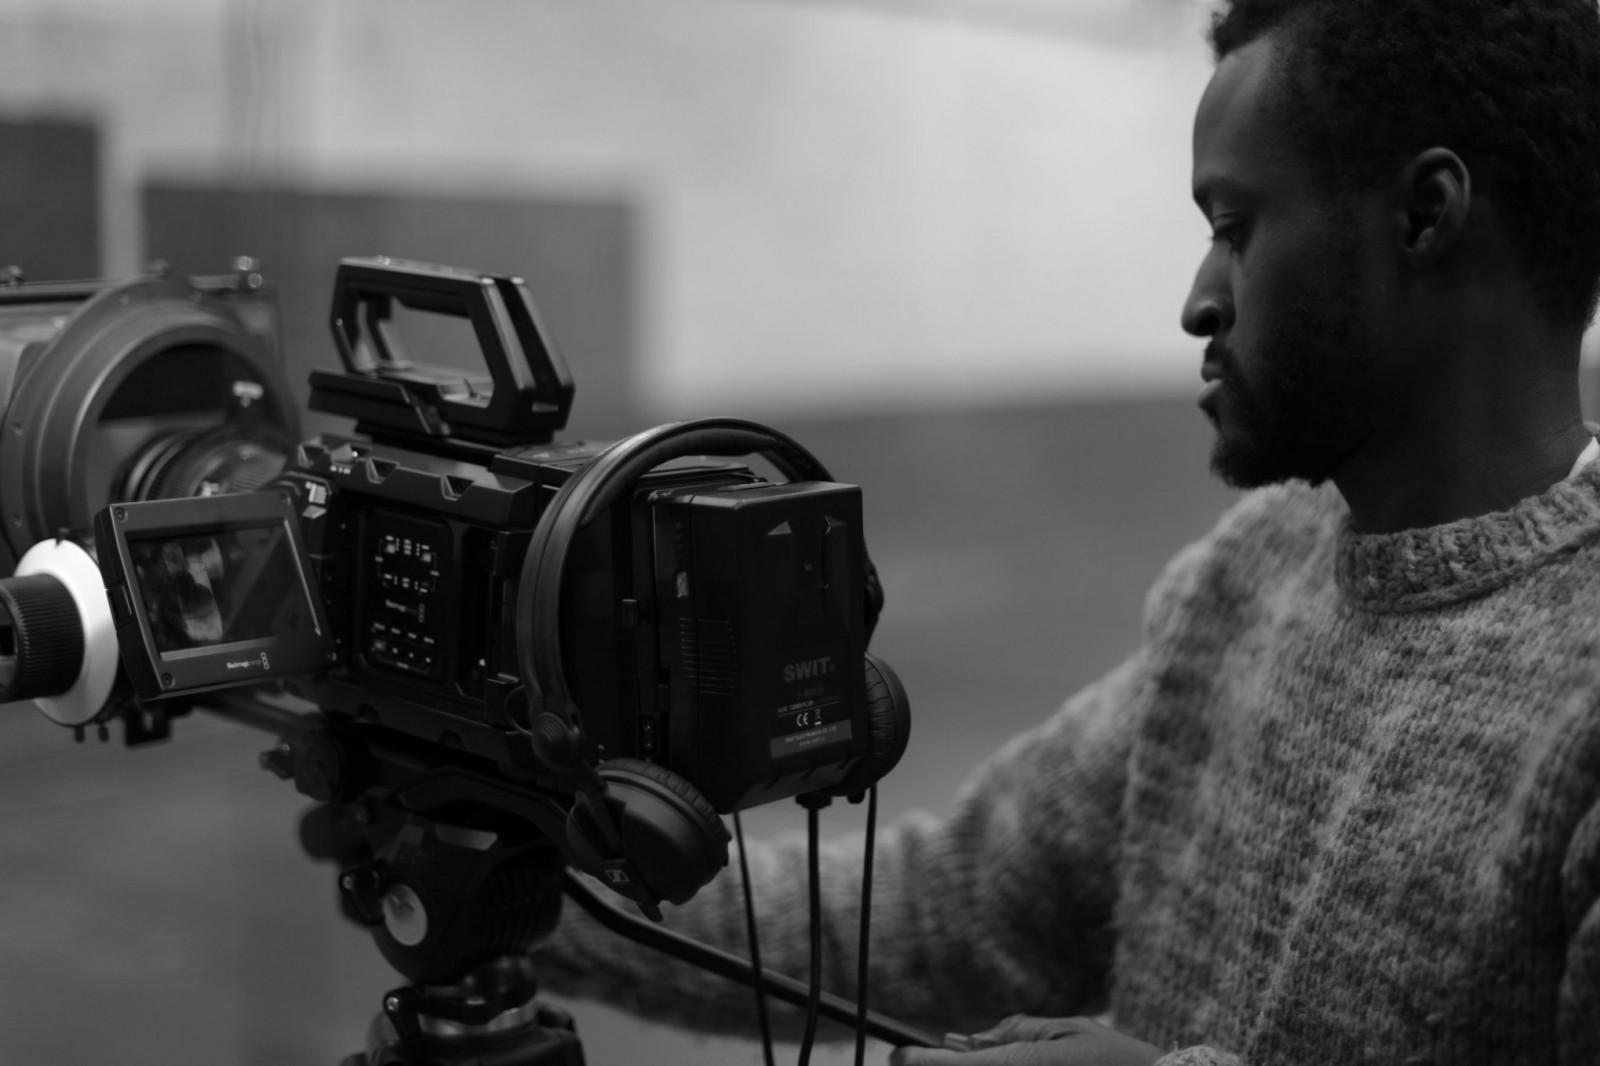 Wallpaper : director, filming, camera 2039x1359 - Medhi89 ...